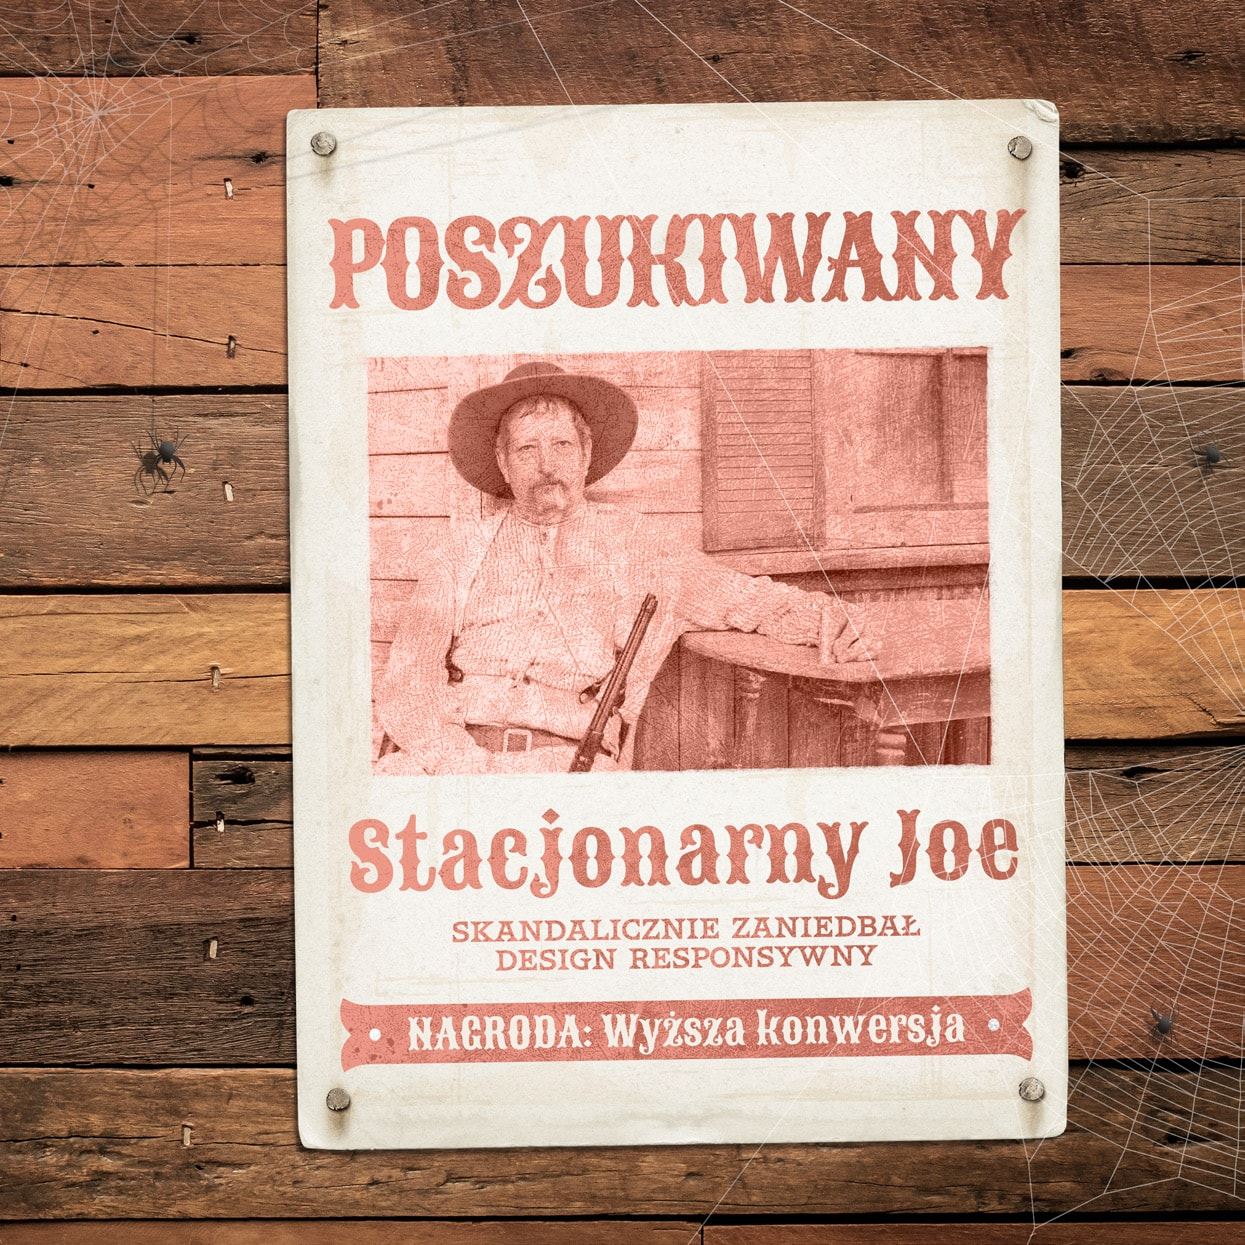 Stacjonarny Joe